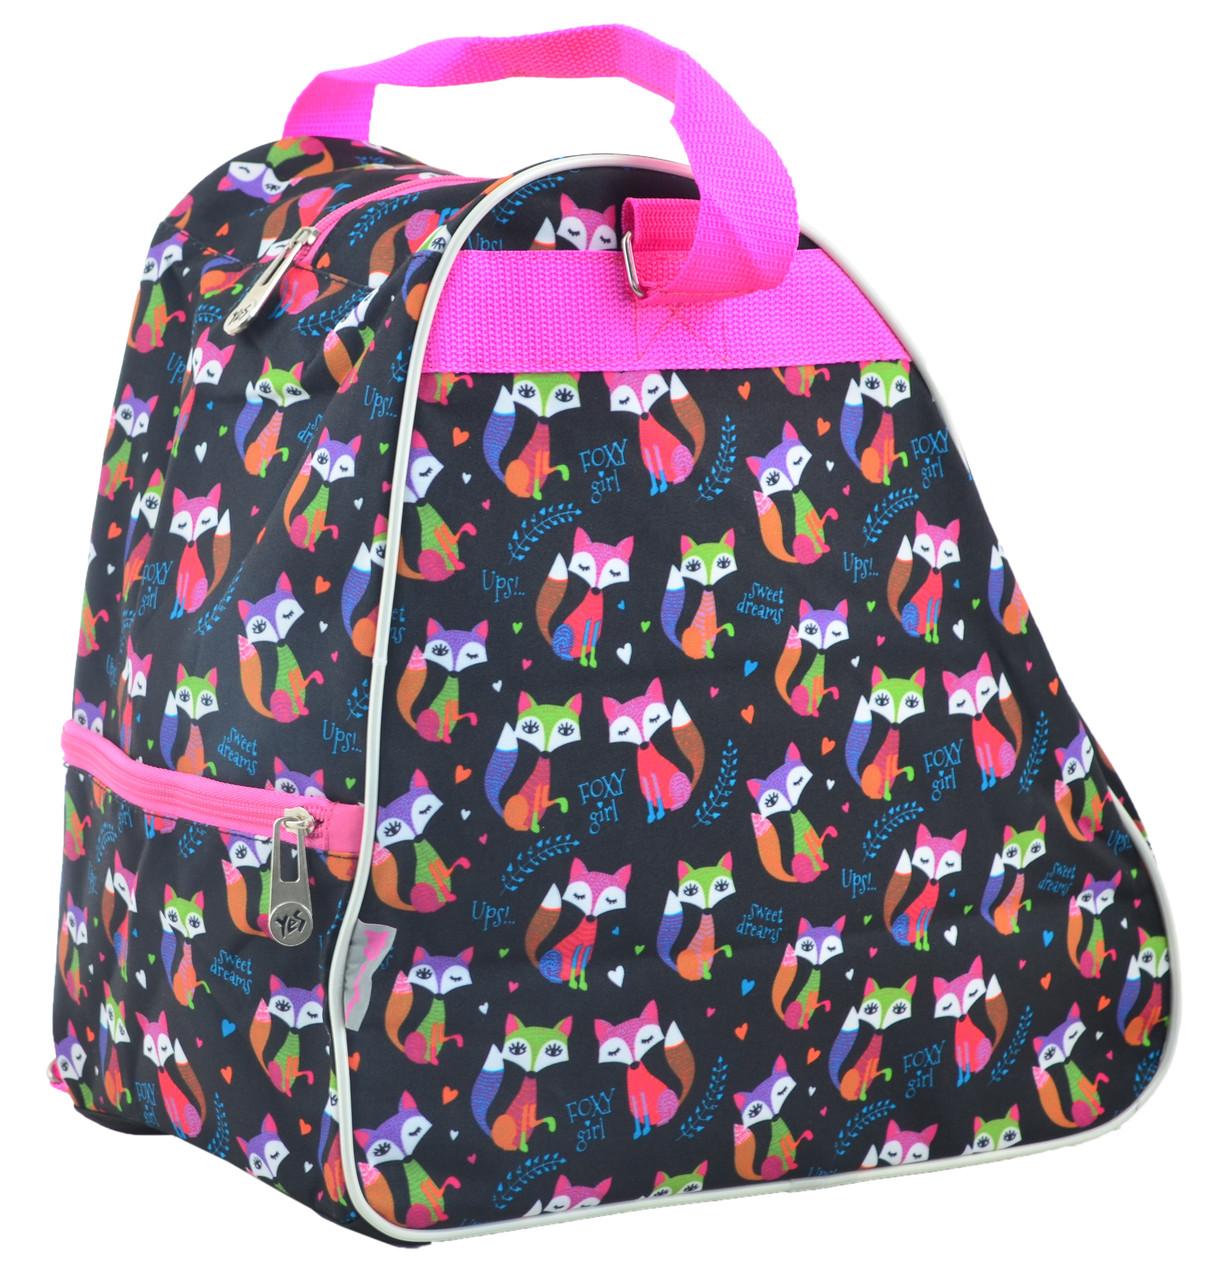 7fe176a8a76c Сумка-рюкзак для детей YES! Sly Fox, 555348, 22 л, чёрная, цена 607 ...